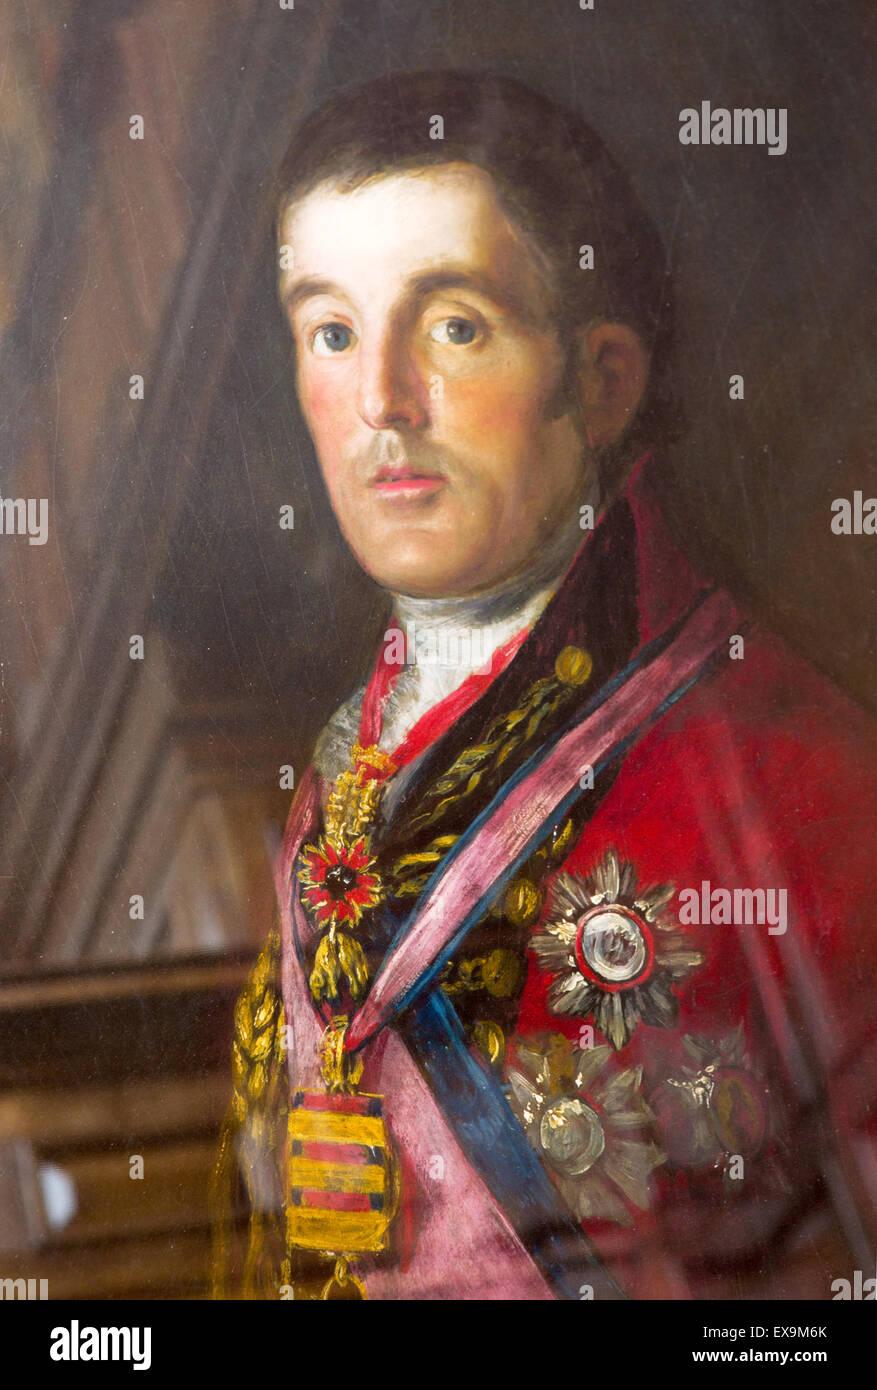 Portrait of the Duke of Wellington By Goya Royal Hospital Chelsea Home of Chelsea Pensioners  London UK - Stock Image